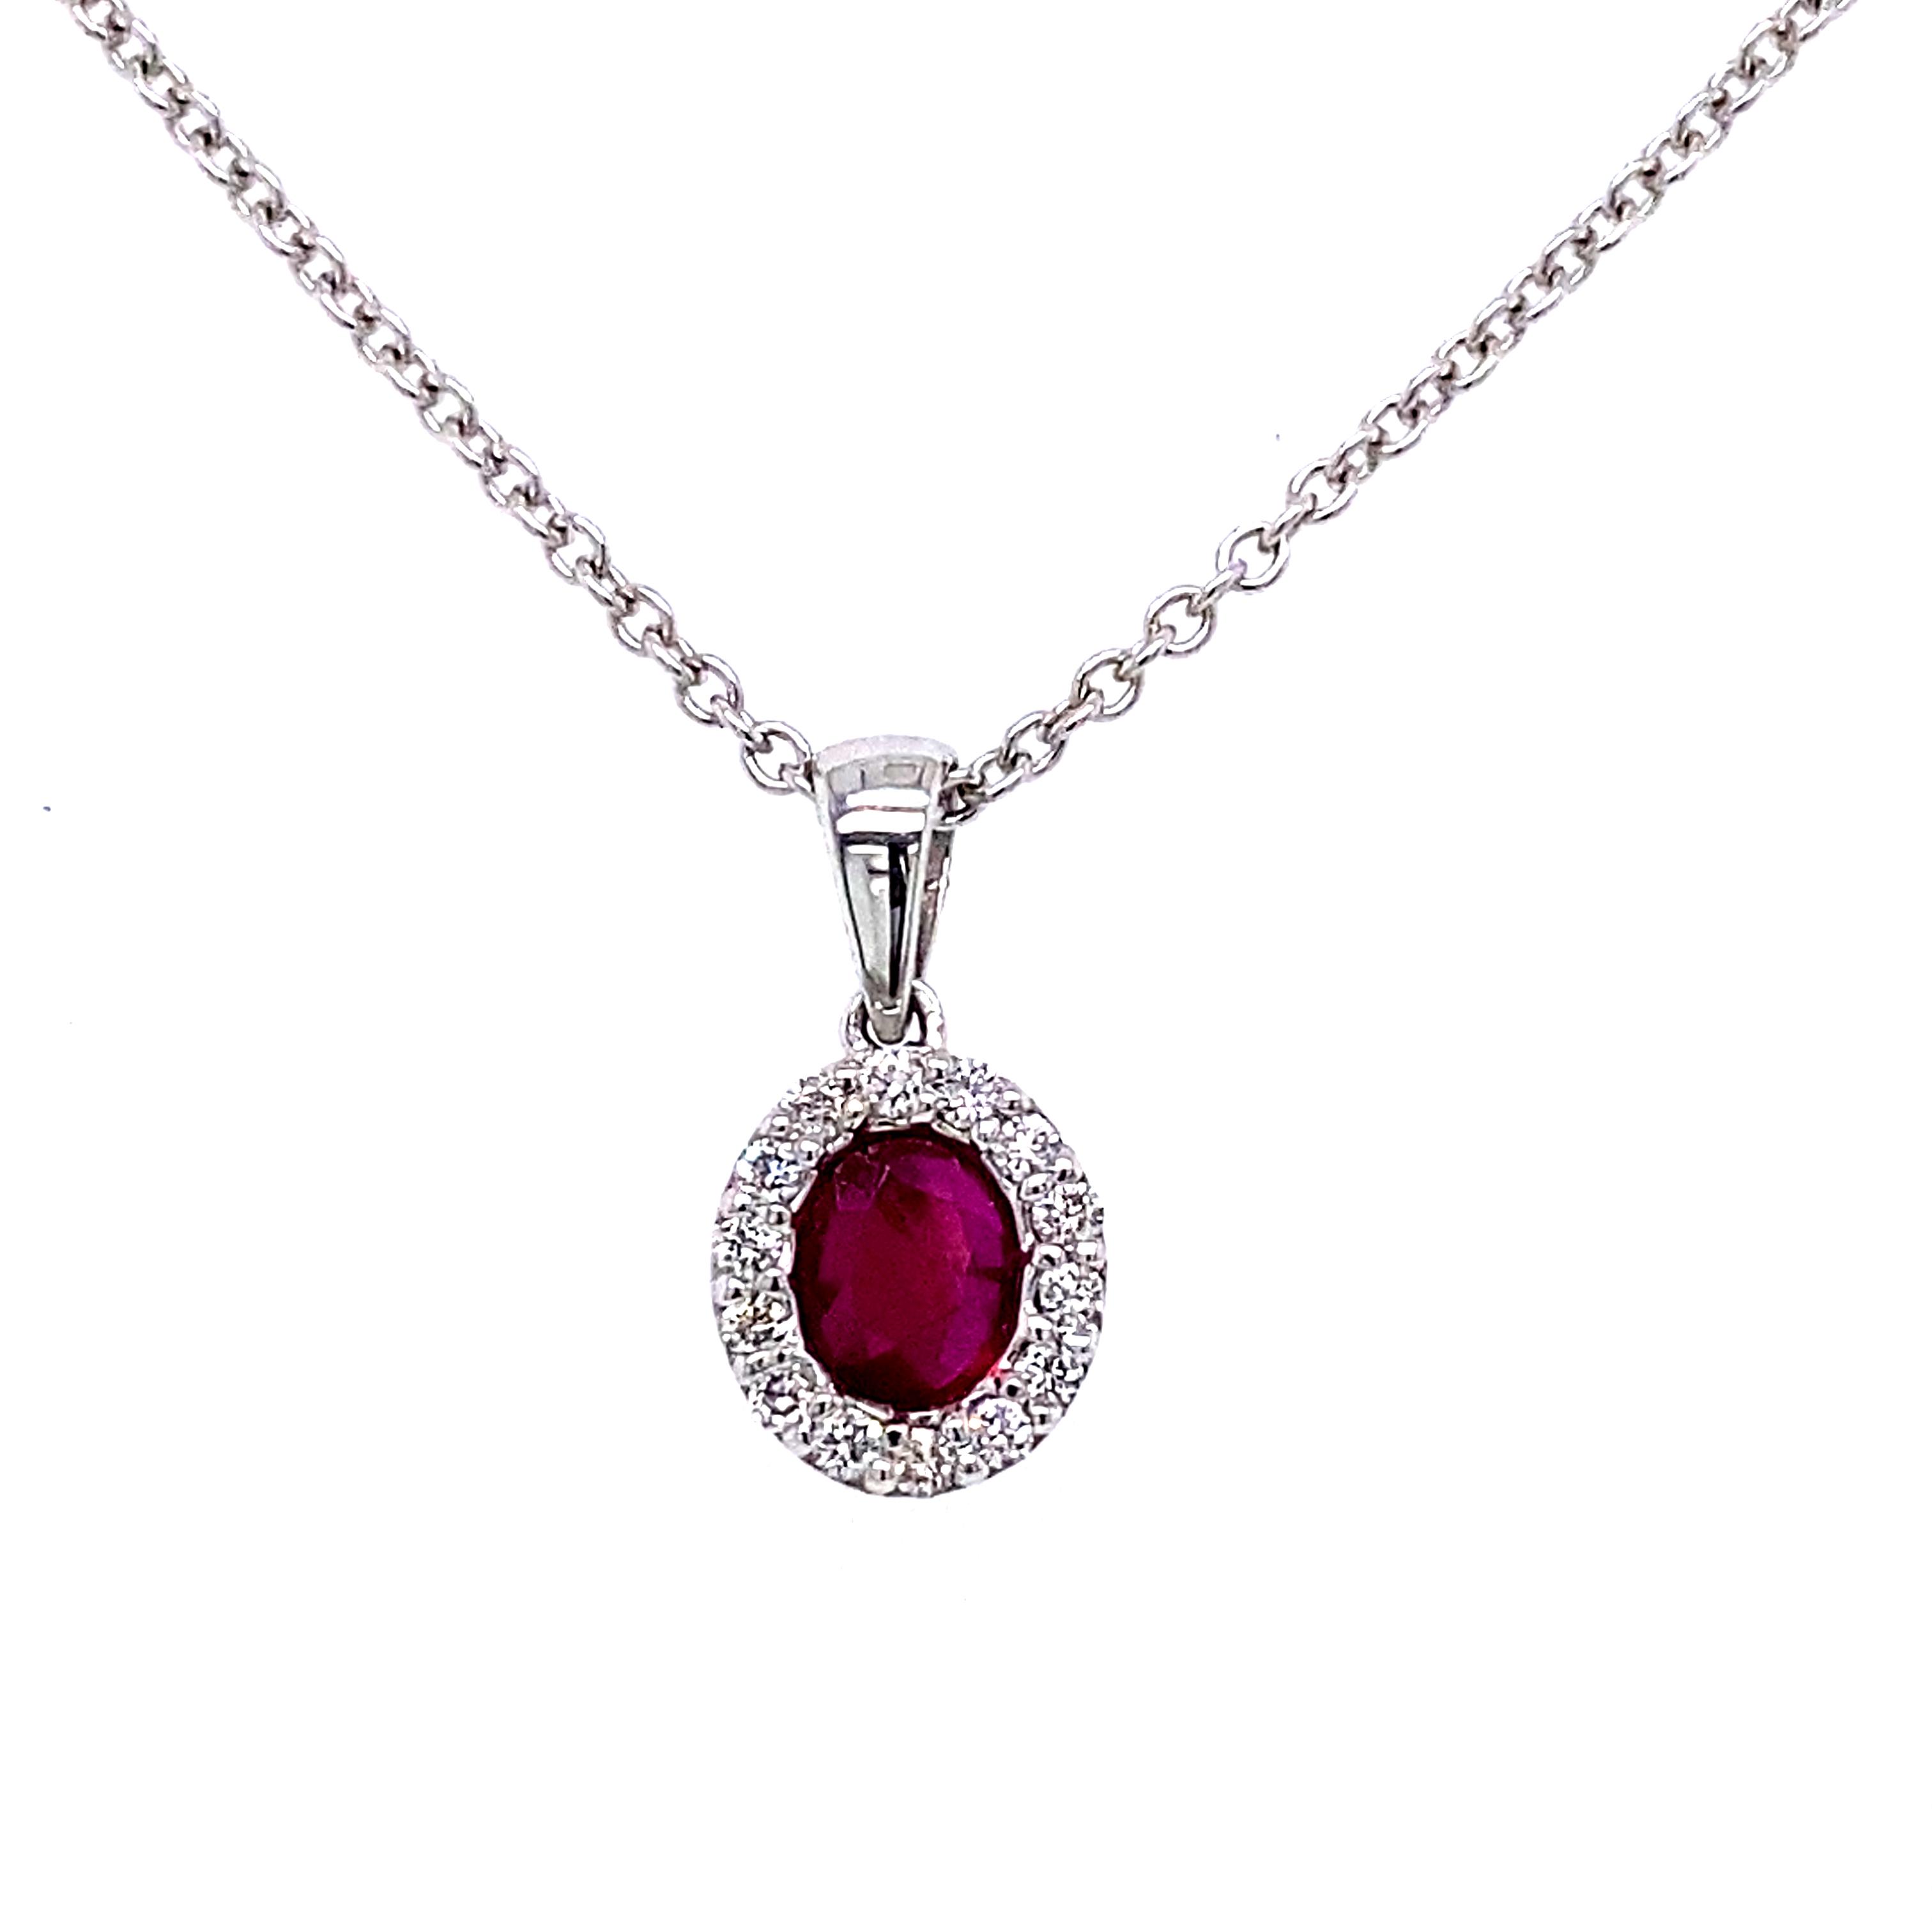 18 Carat White Gold, Ruby and Diamond Pendant